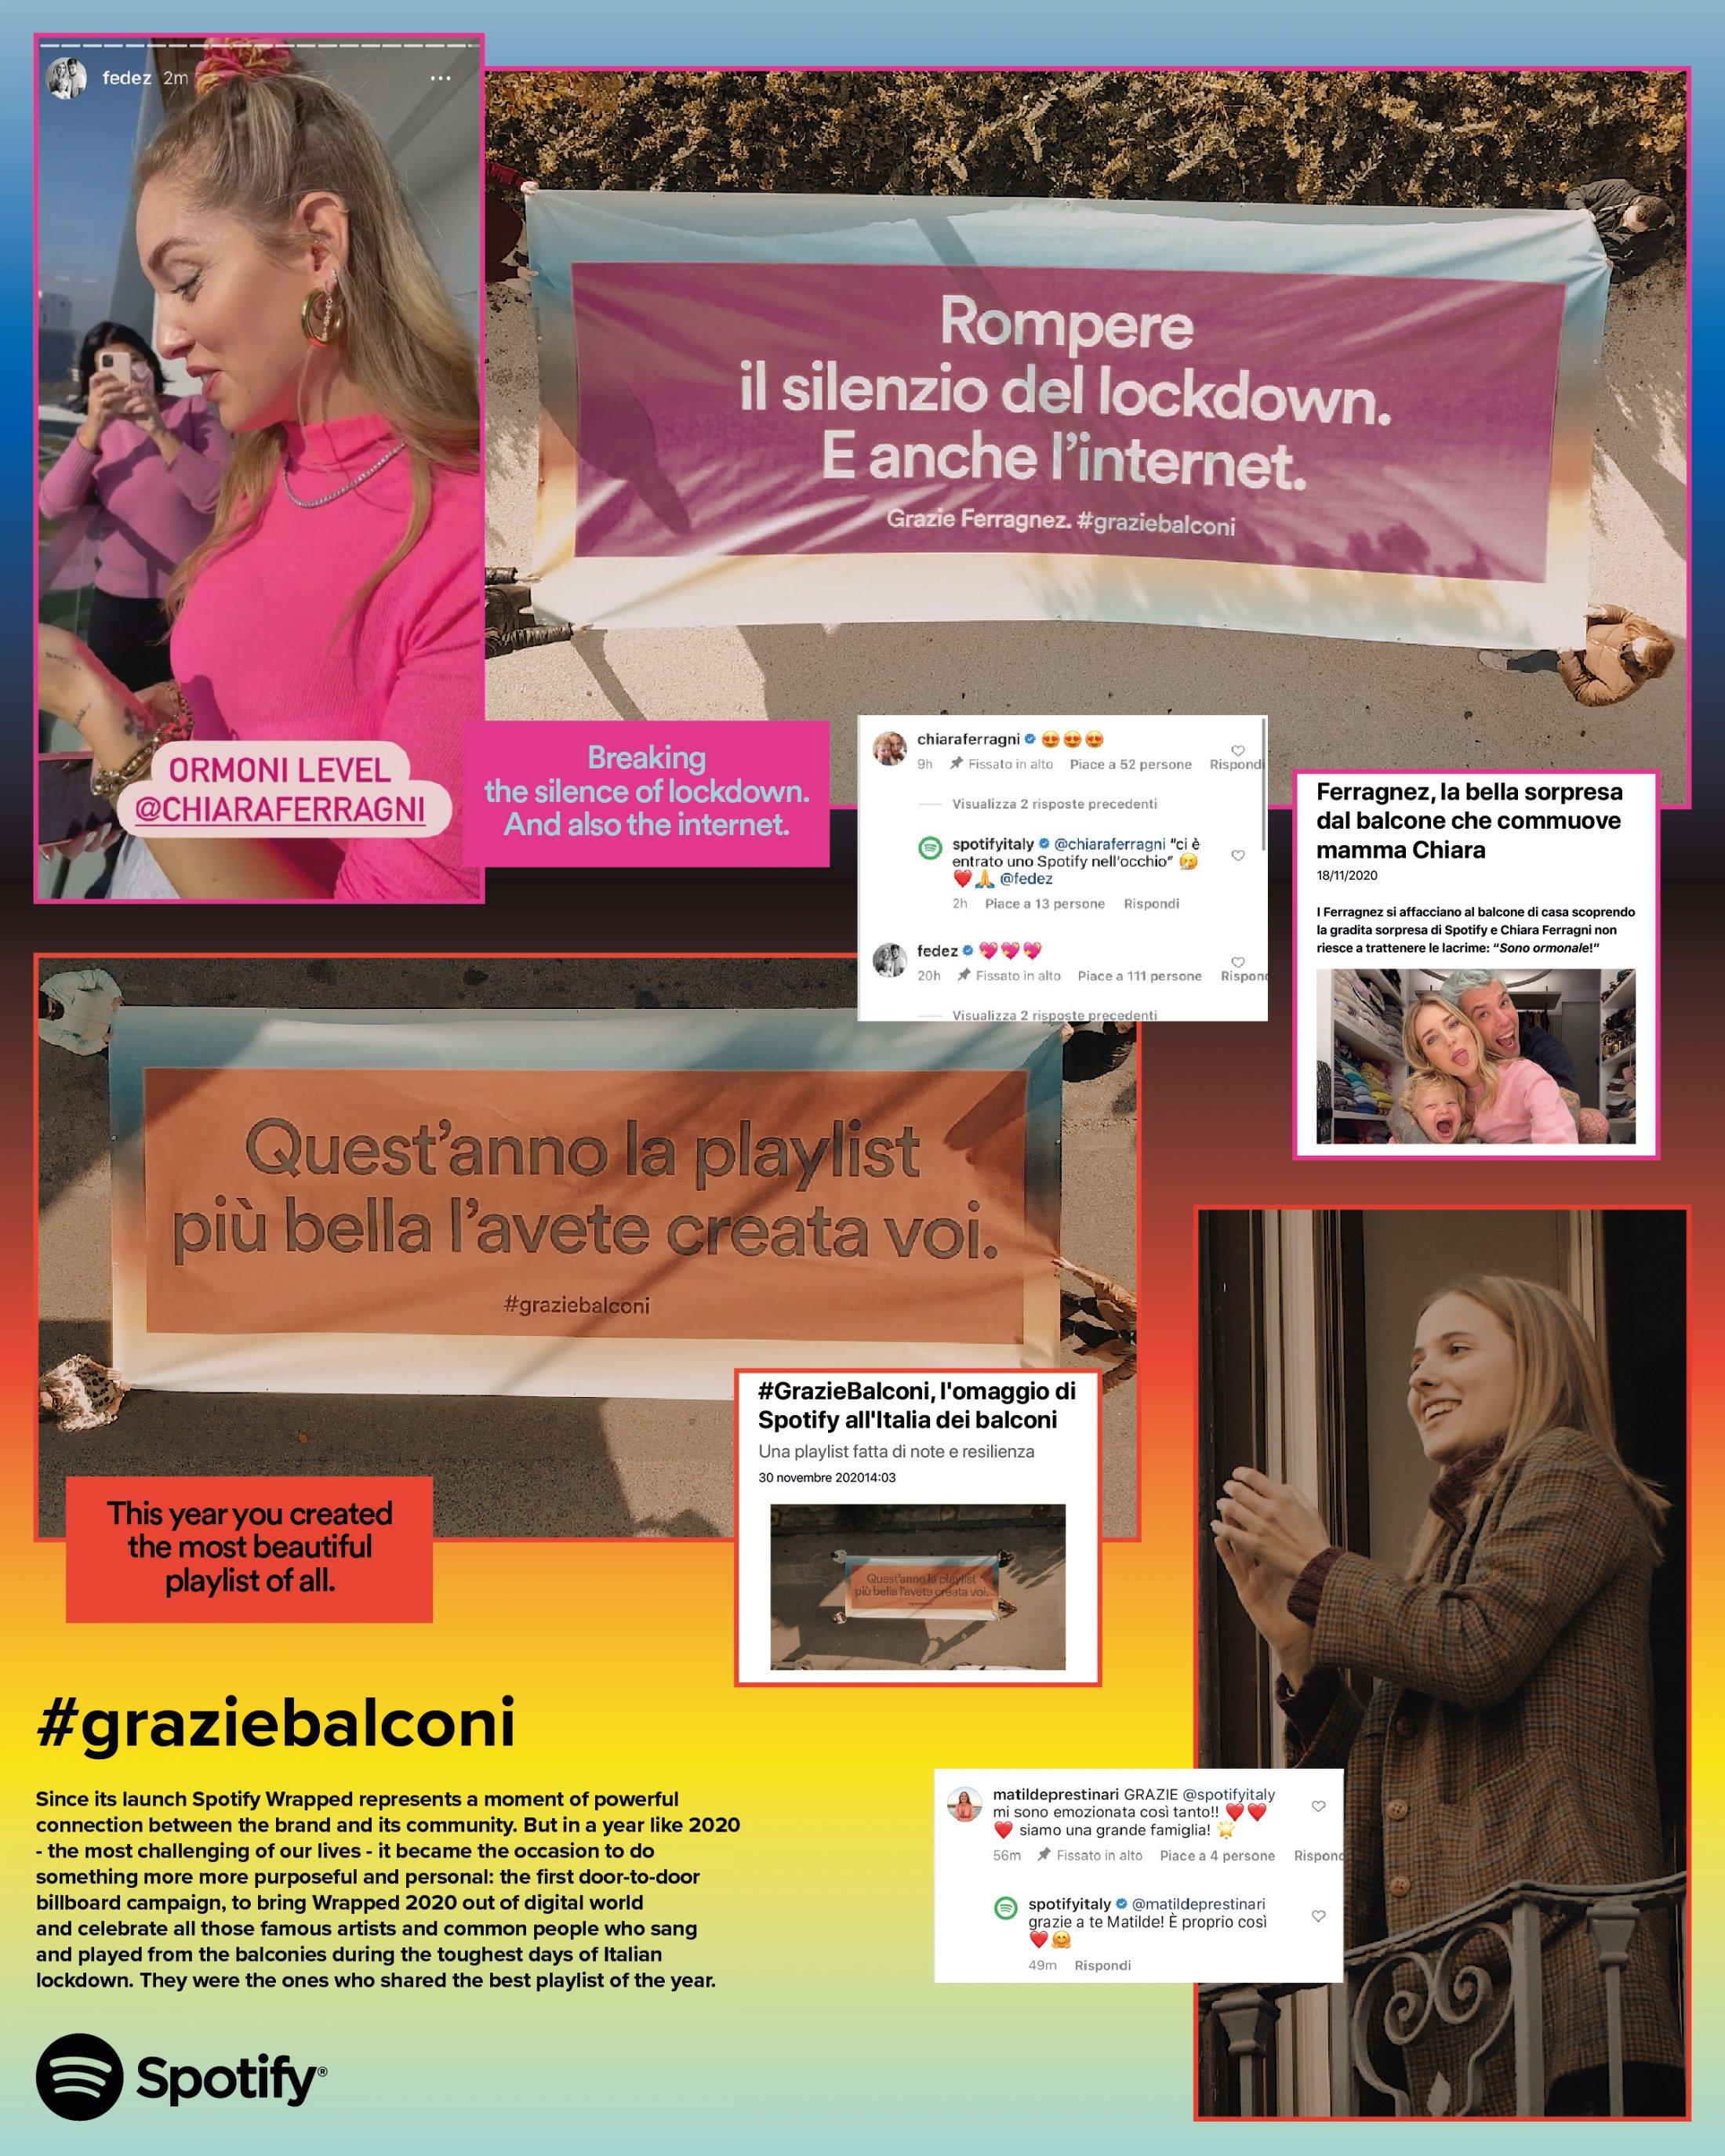 Thumbnail for #graziebalconi